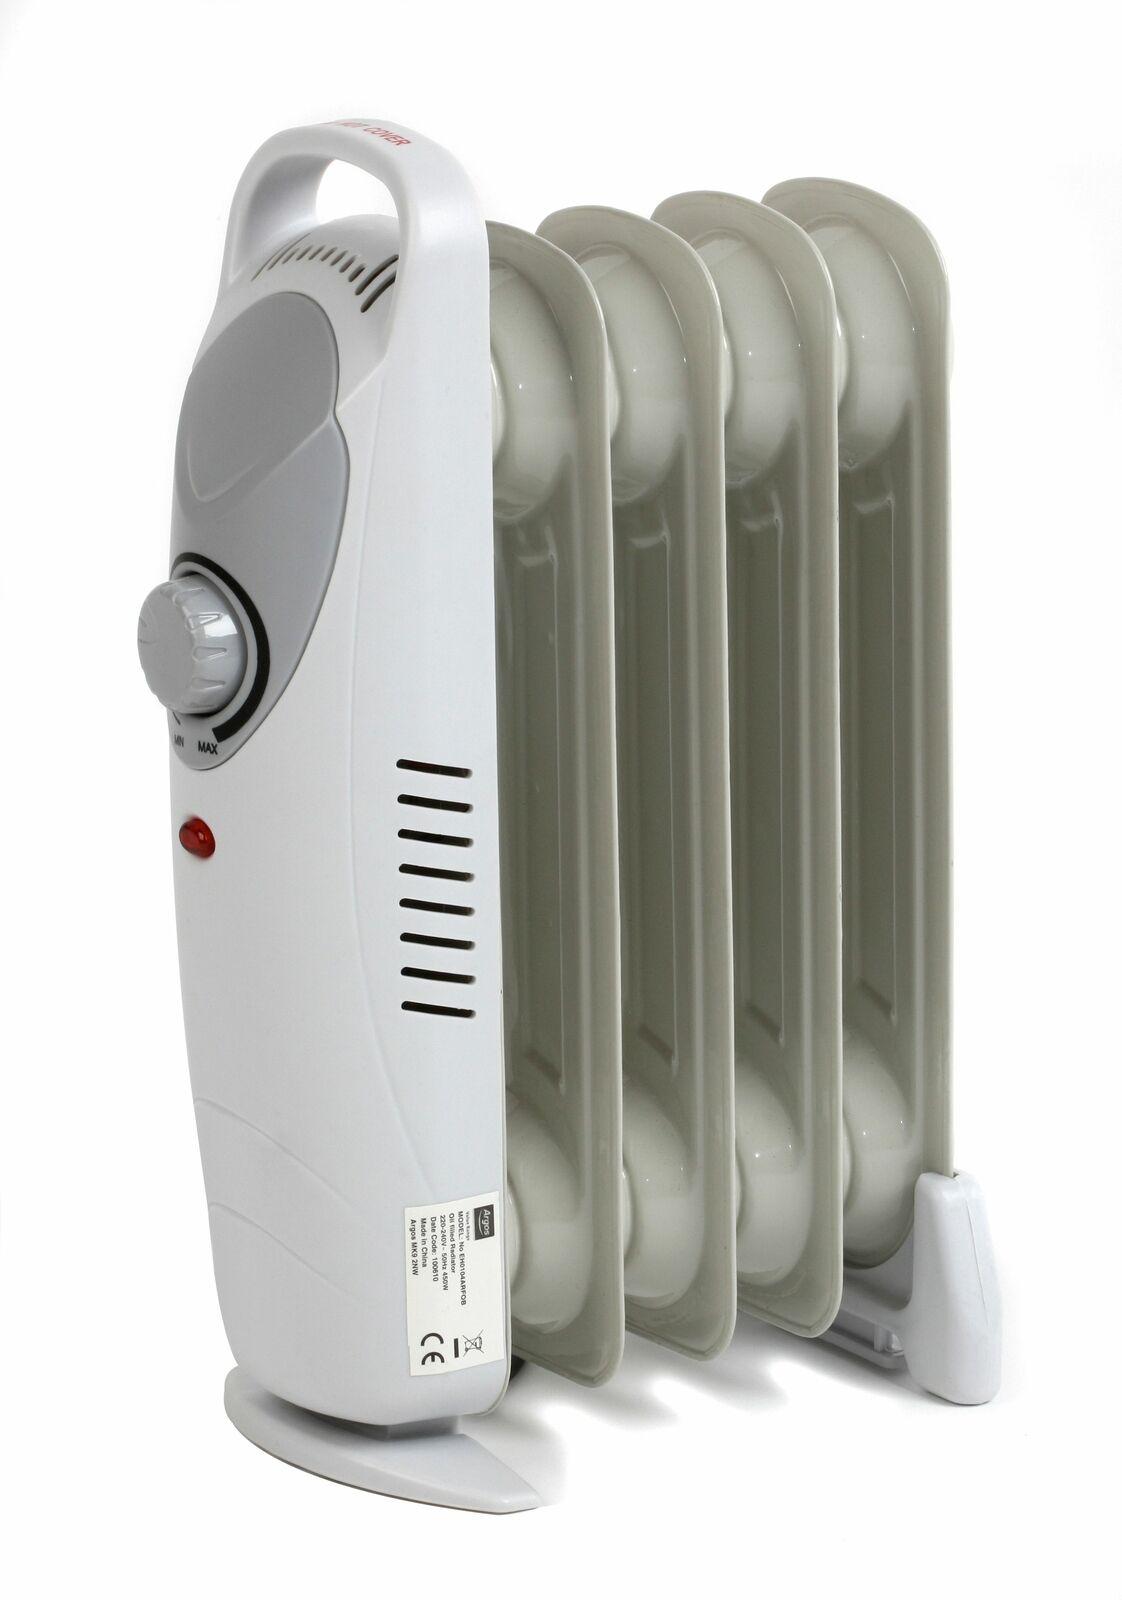 Simple Value 0.45kW Mini Freestanding Oil Filled Radiator - £11.99 Delivered @ Argos eBay